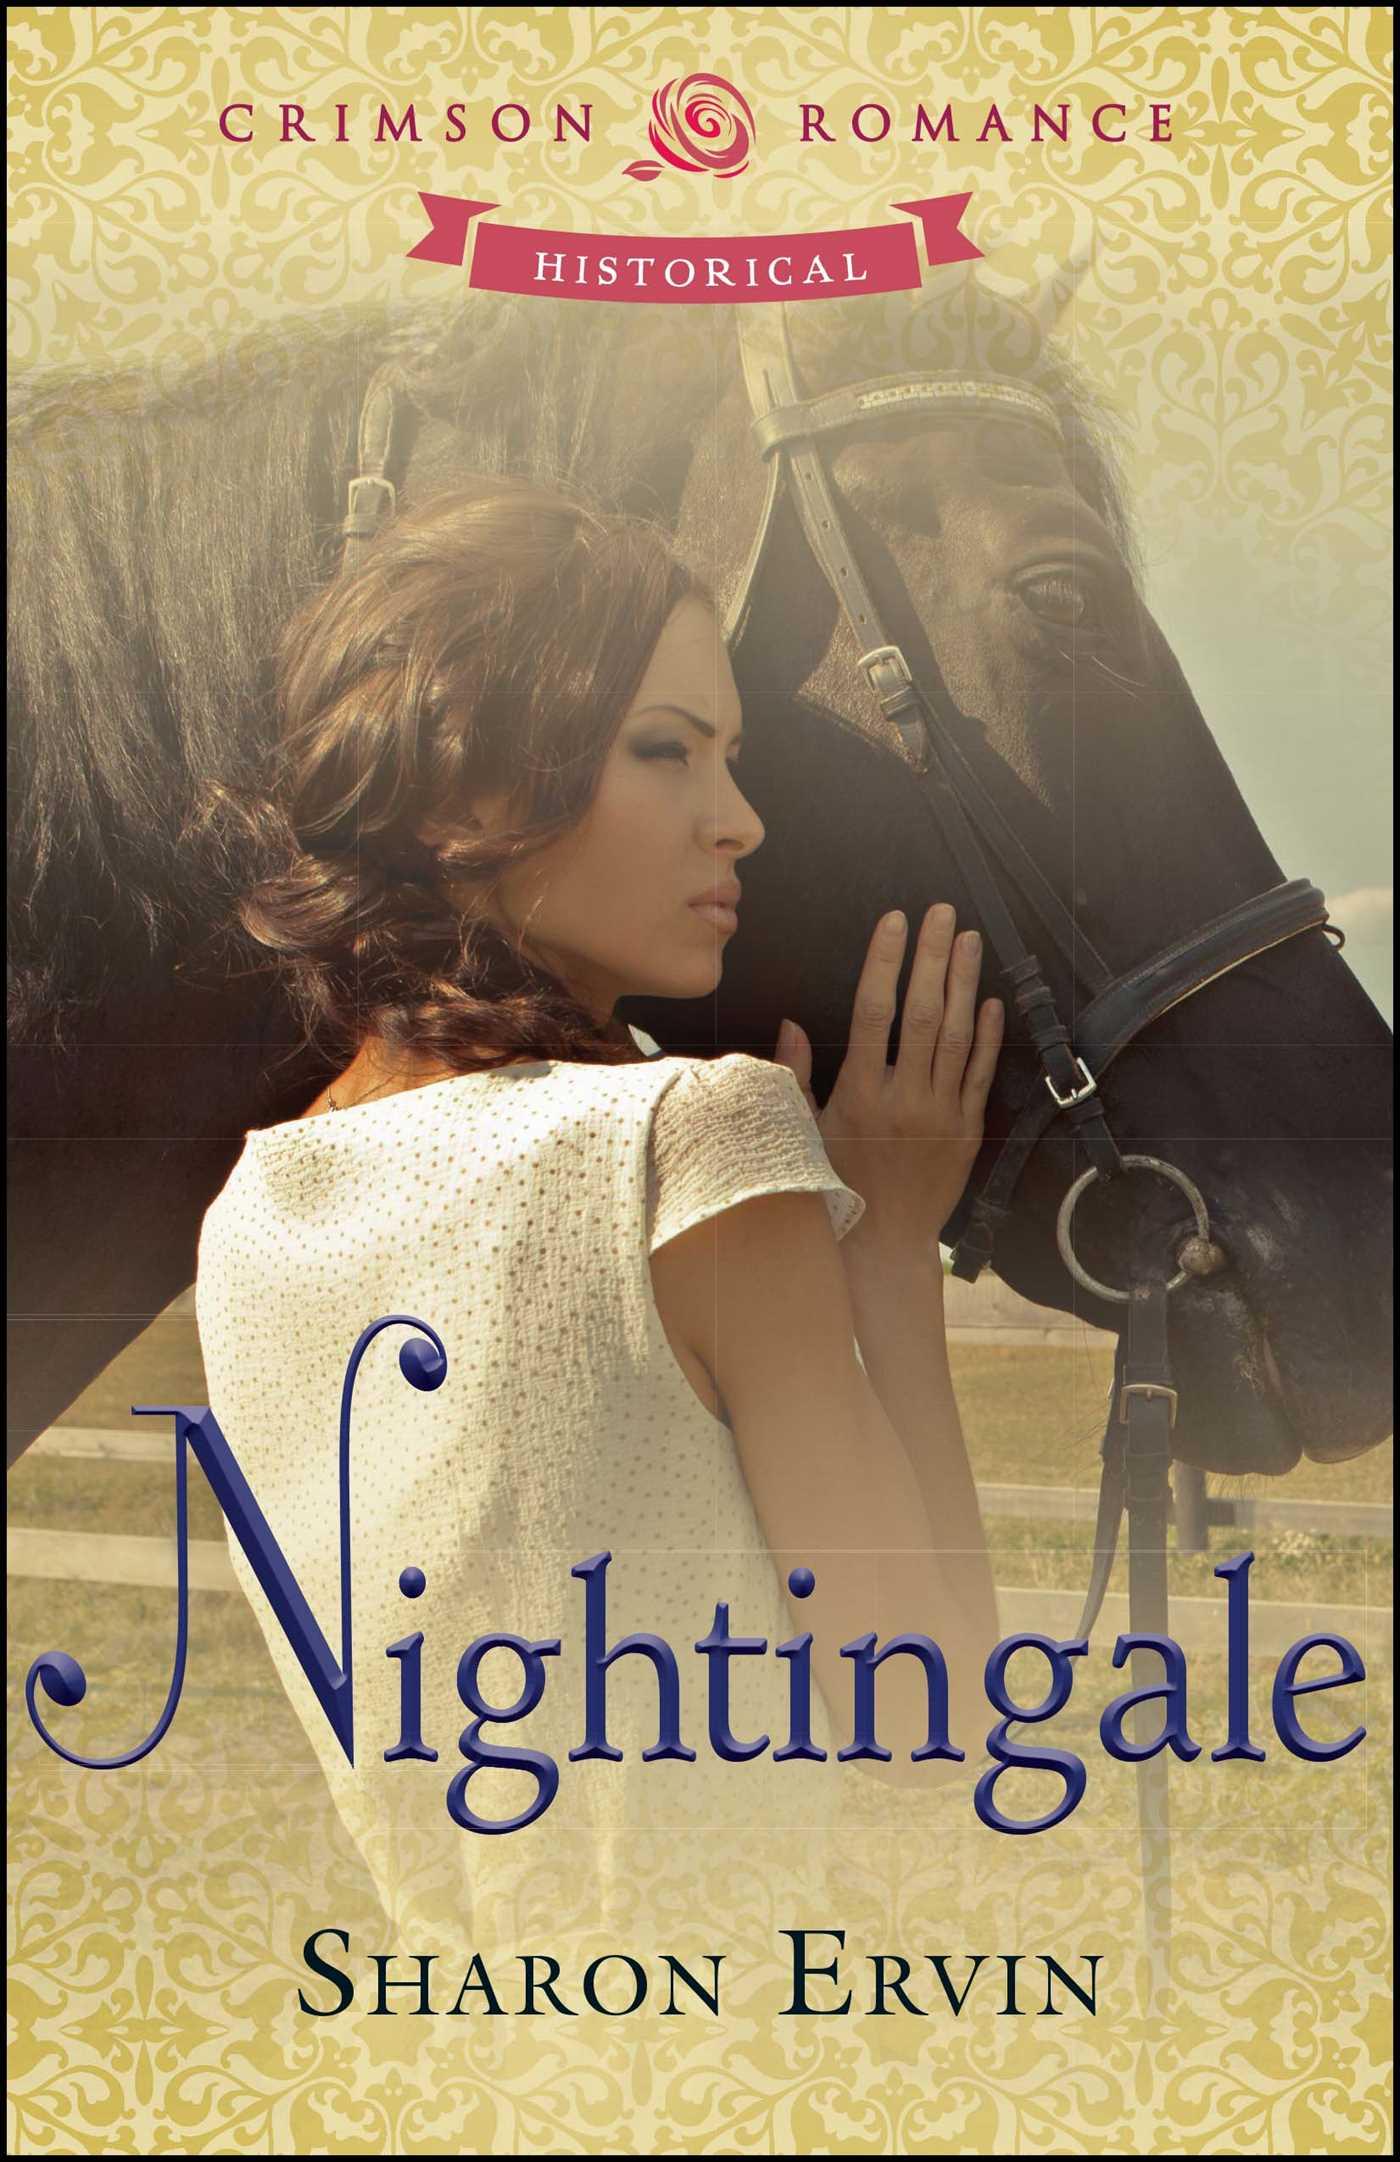 Nightingale 9781440568107 hr